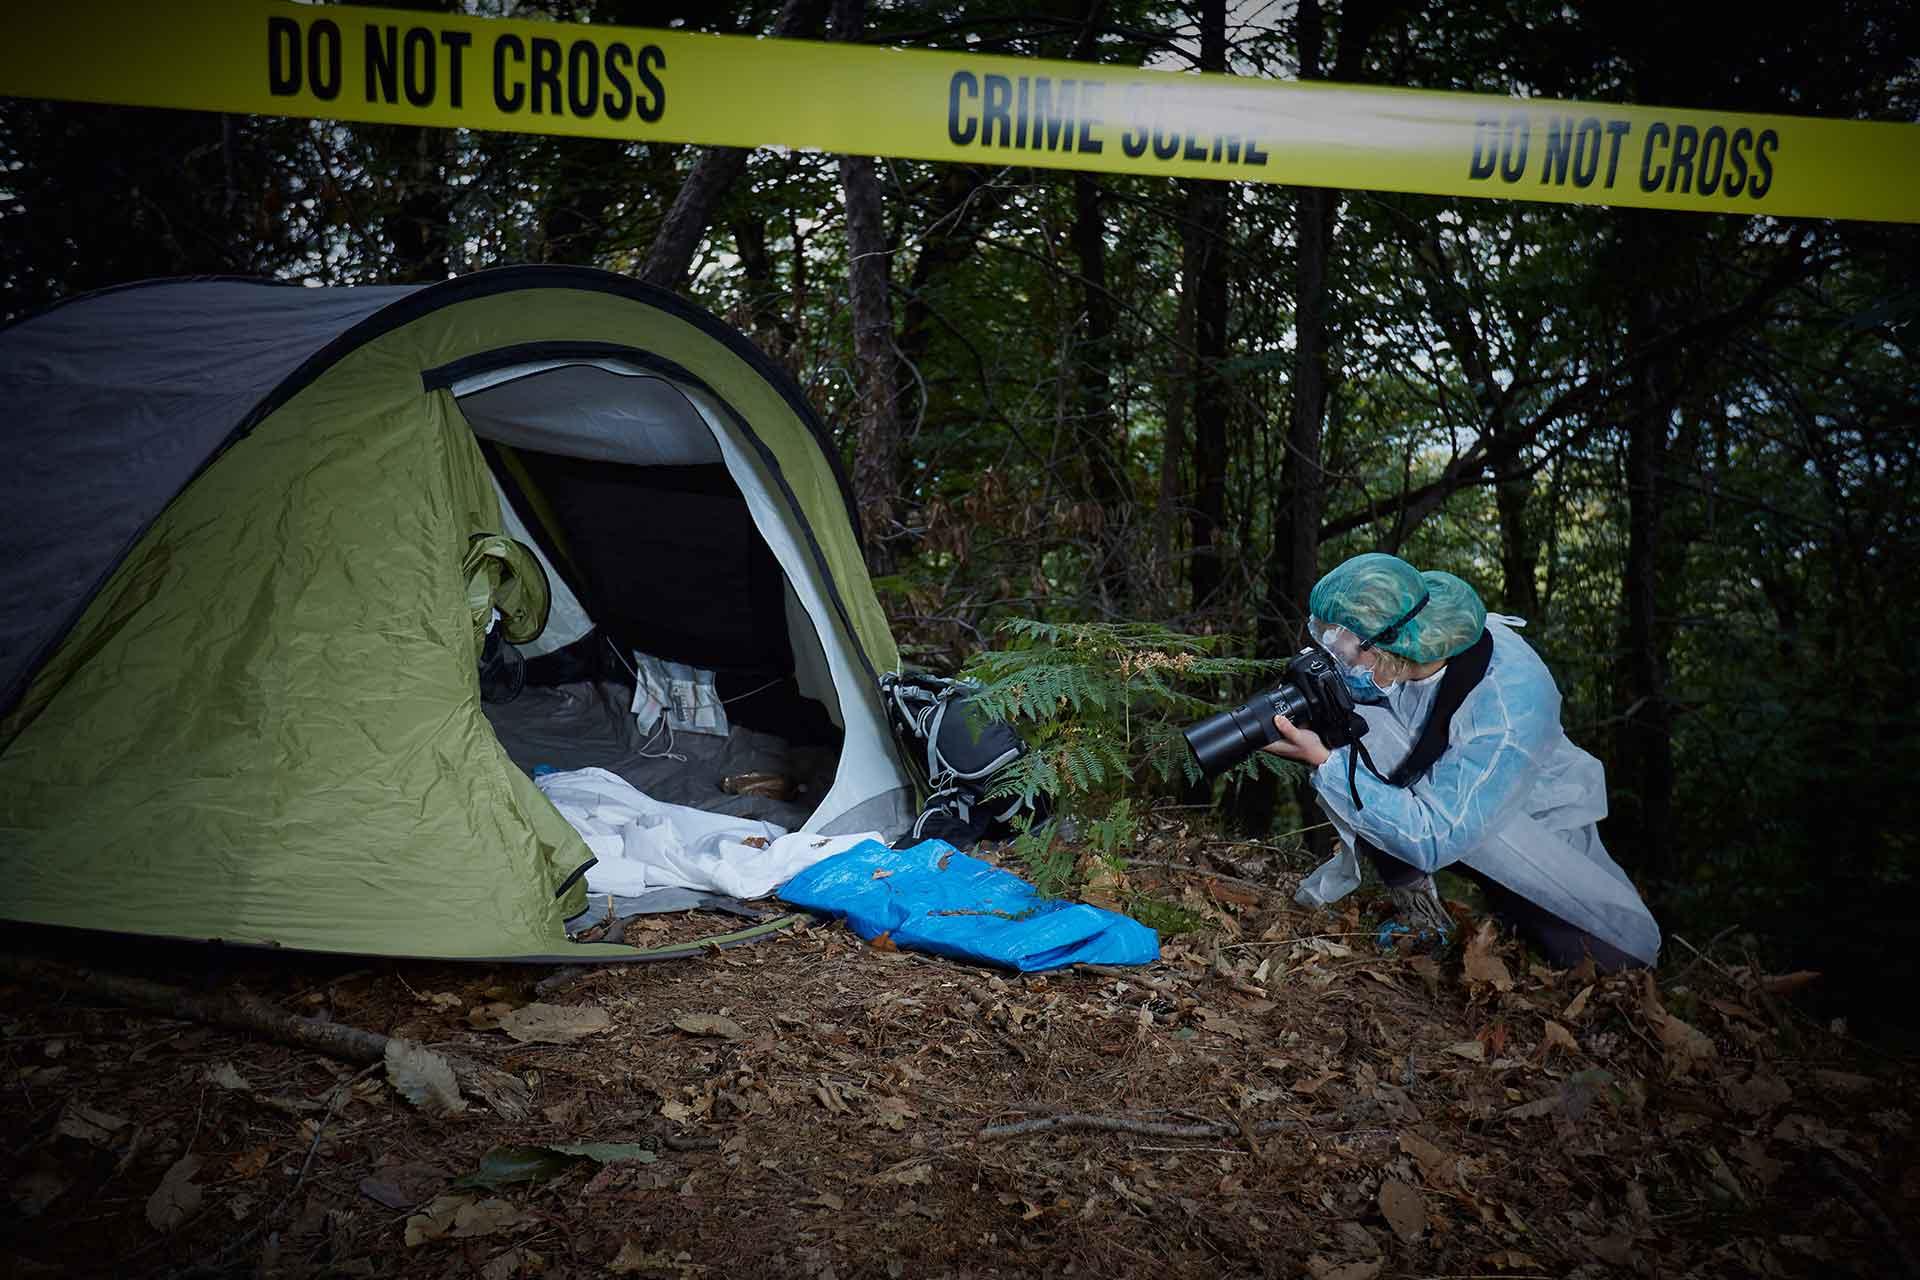 Spraakmakende strafzaken campingmoord - Weening Strafrechtadvocaten